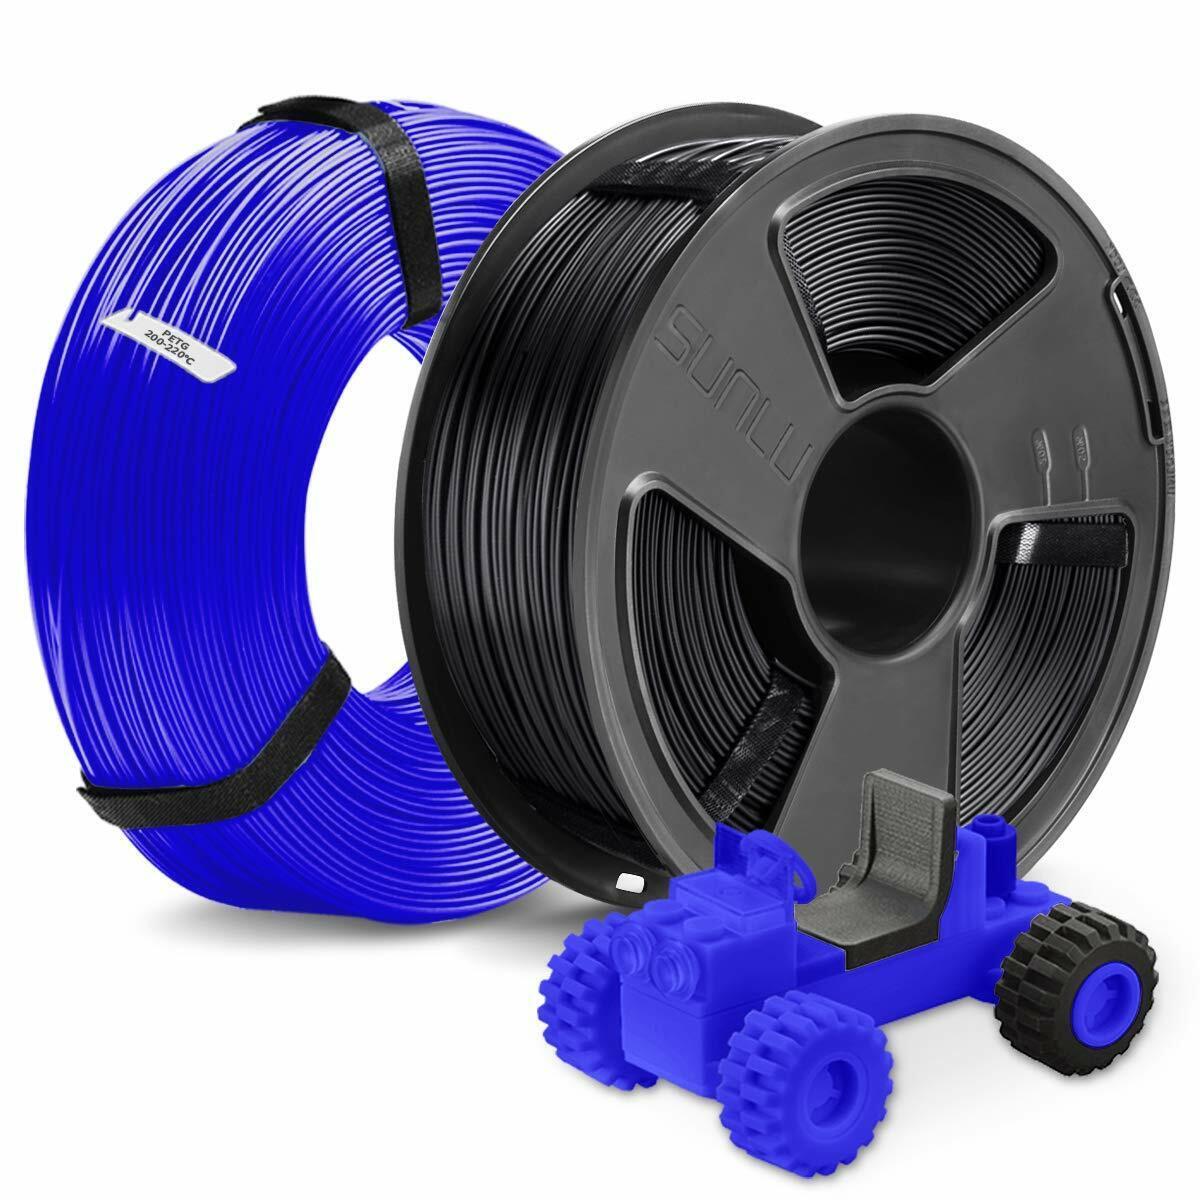 2kg 1.75mm PETG 3D Printer Filament, Tolerance +/- 0.02 mm, Black and Blue